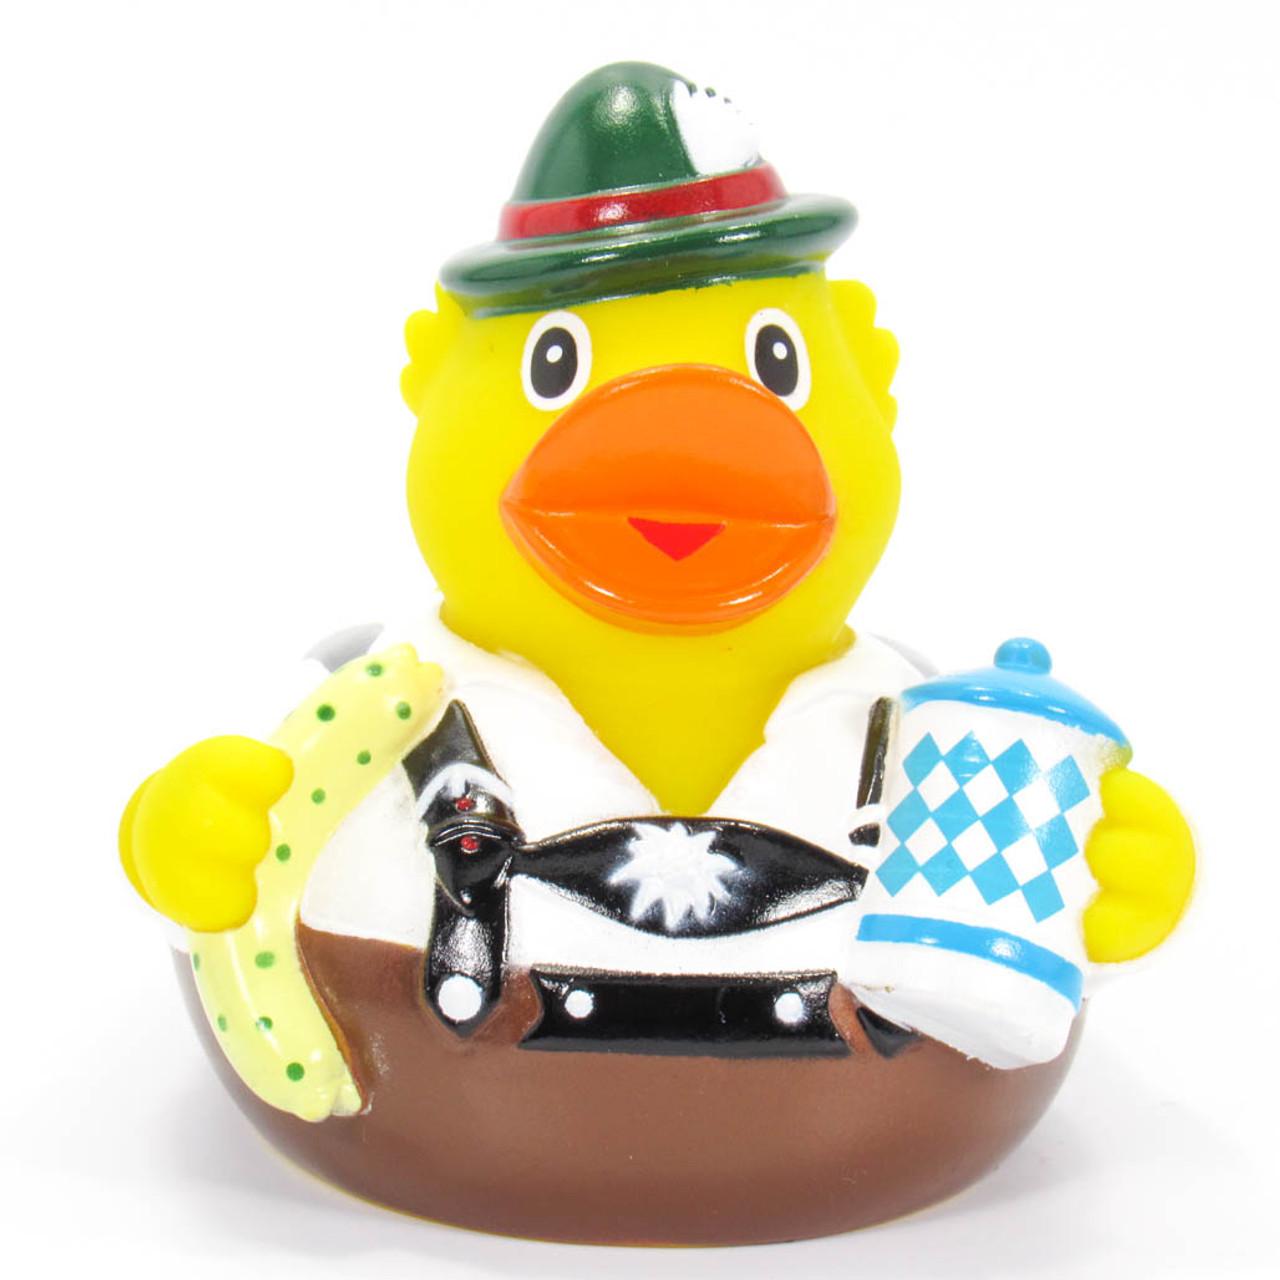 Bathduck Bavaria Rubber Ducky Rubber Duckie Rubber Duck Germany